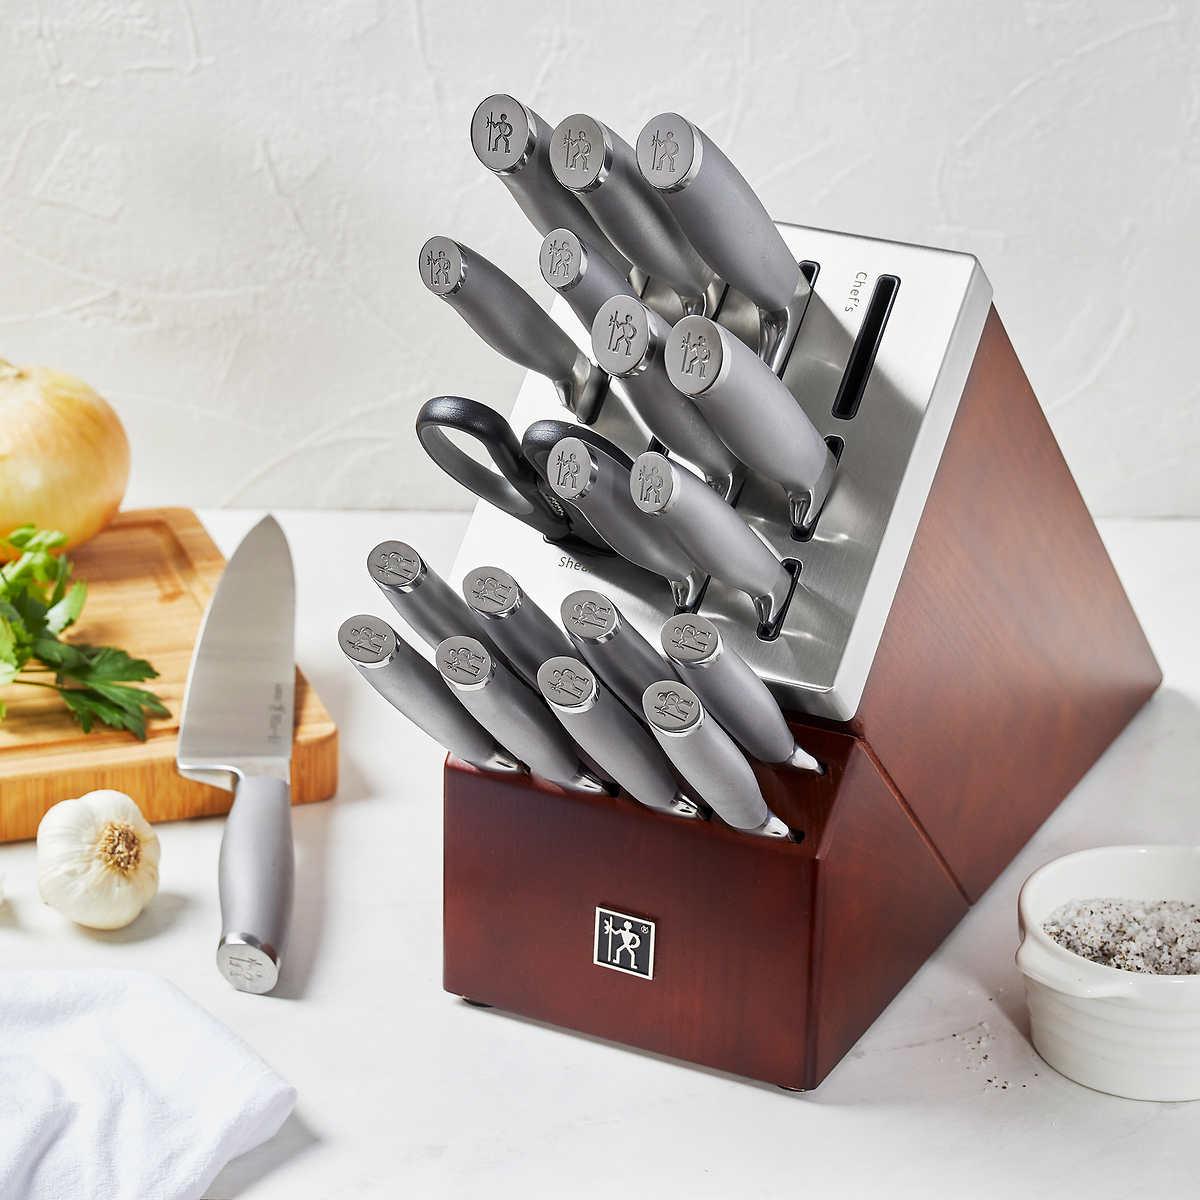 Henckels Modernist 20 Piece Self Sharpening Knife Block Set